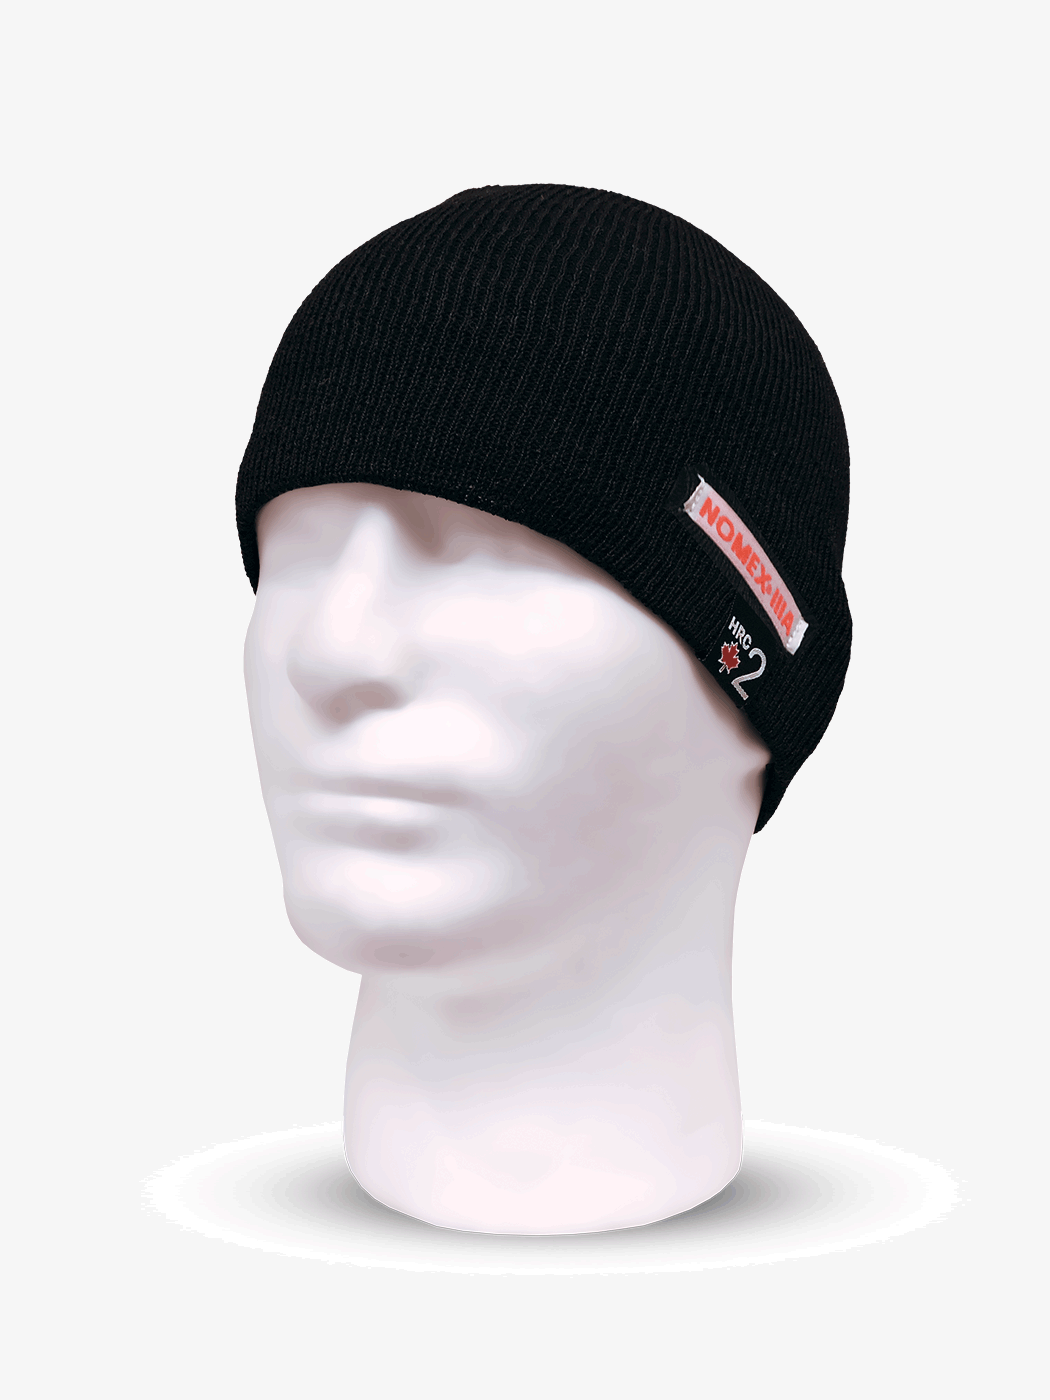 Nomex®IIIA Knit Rib Beanie – Style J64